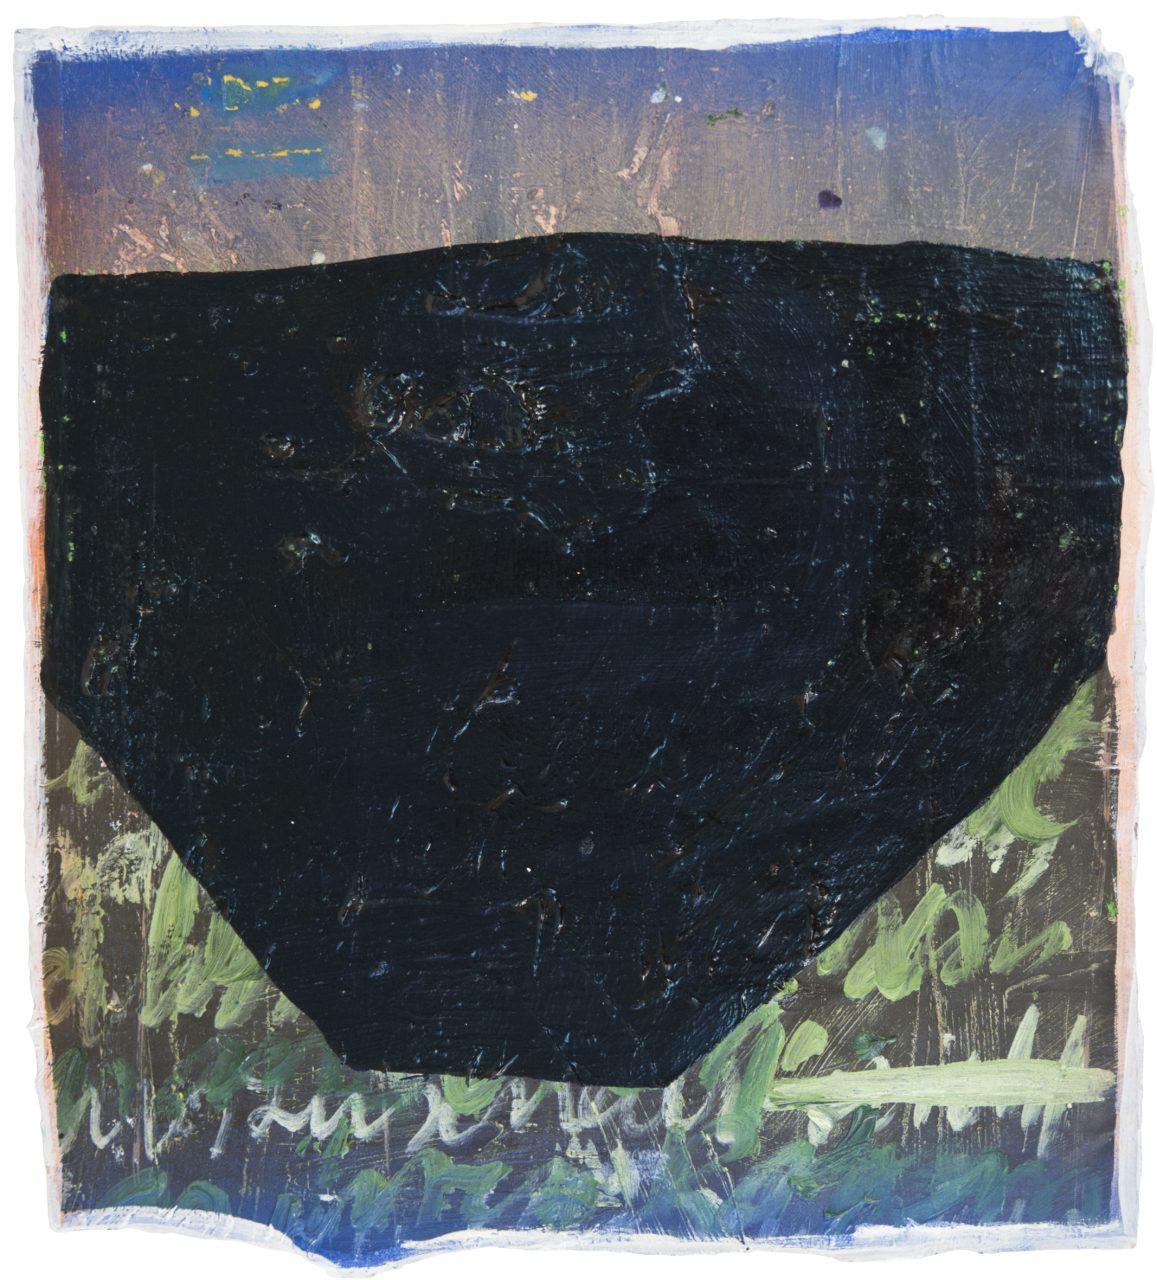 Alphabet P, 2017, oil on paper, 33 x 30 cm